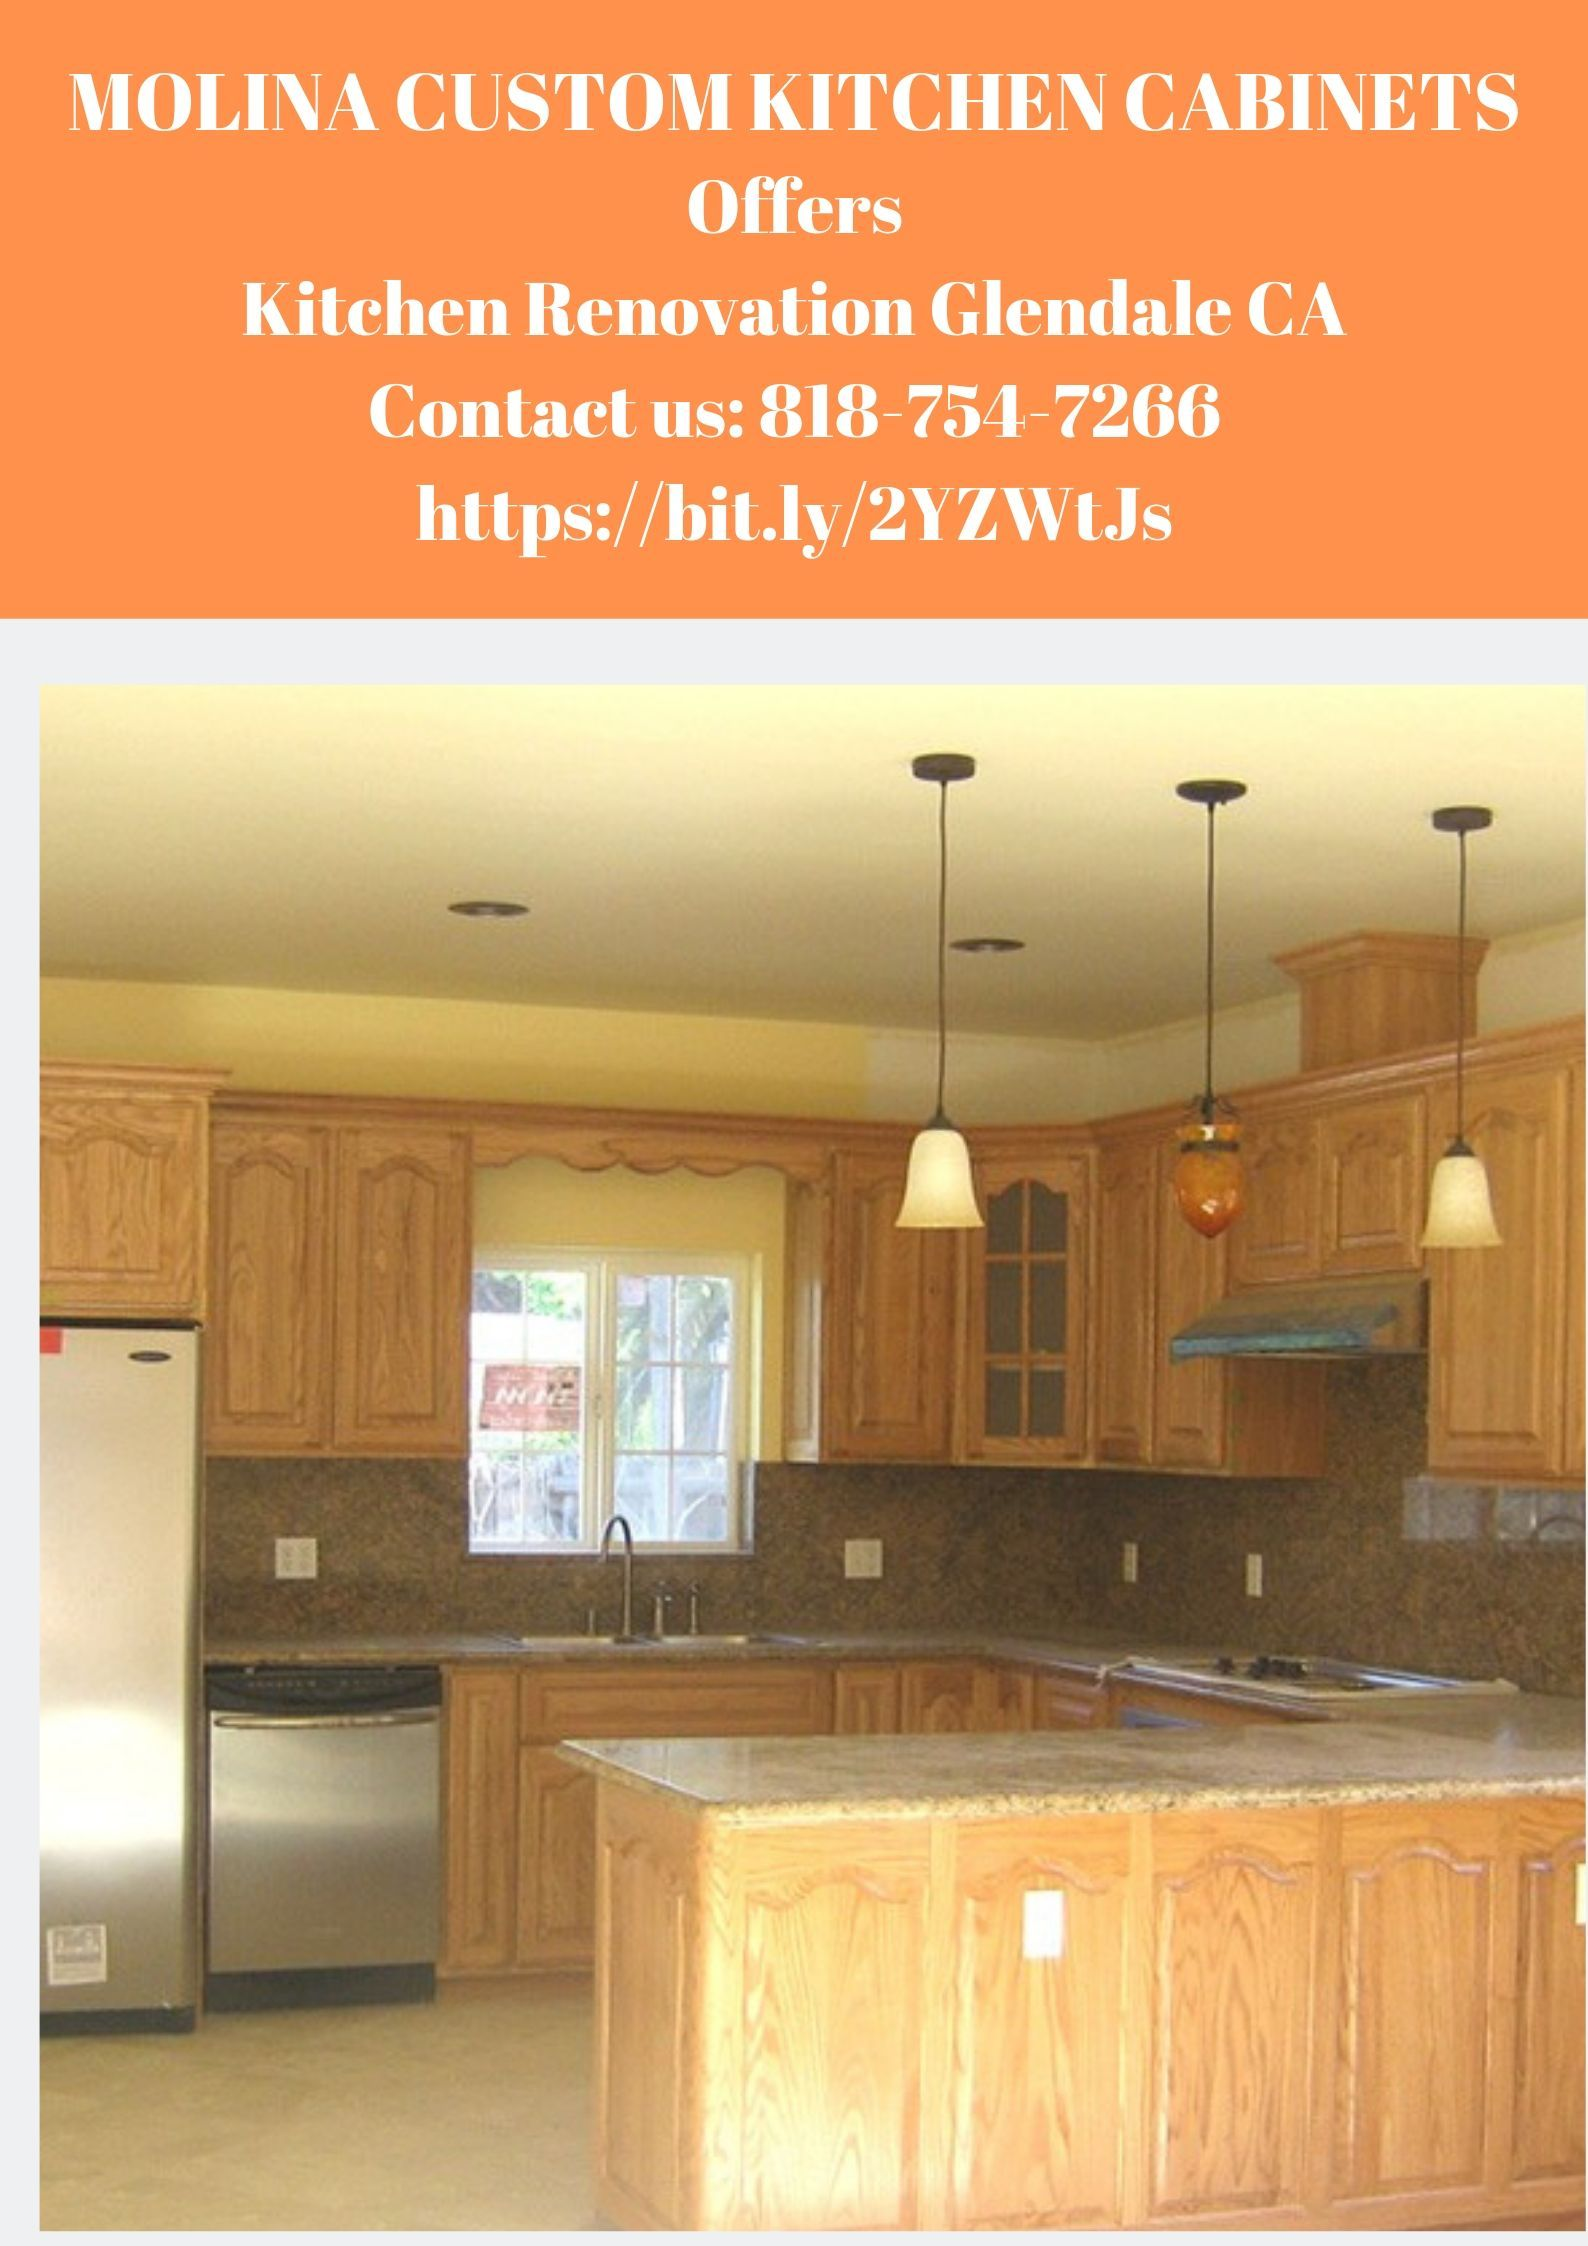 Kitchen Remodeling Estimate Glendale Ca Custom Kitchen Cabinets Kitchen Cabinets Repair Installing Cabinets